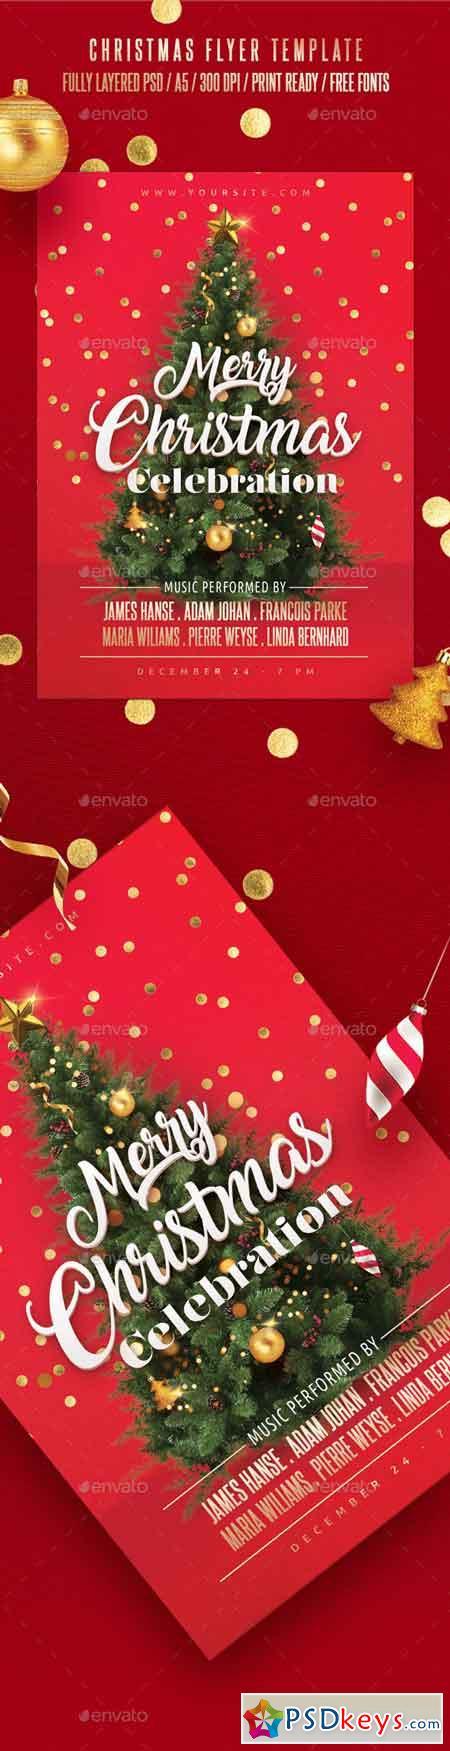 Christmas Flyer Template 22930718